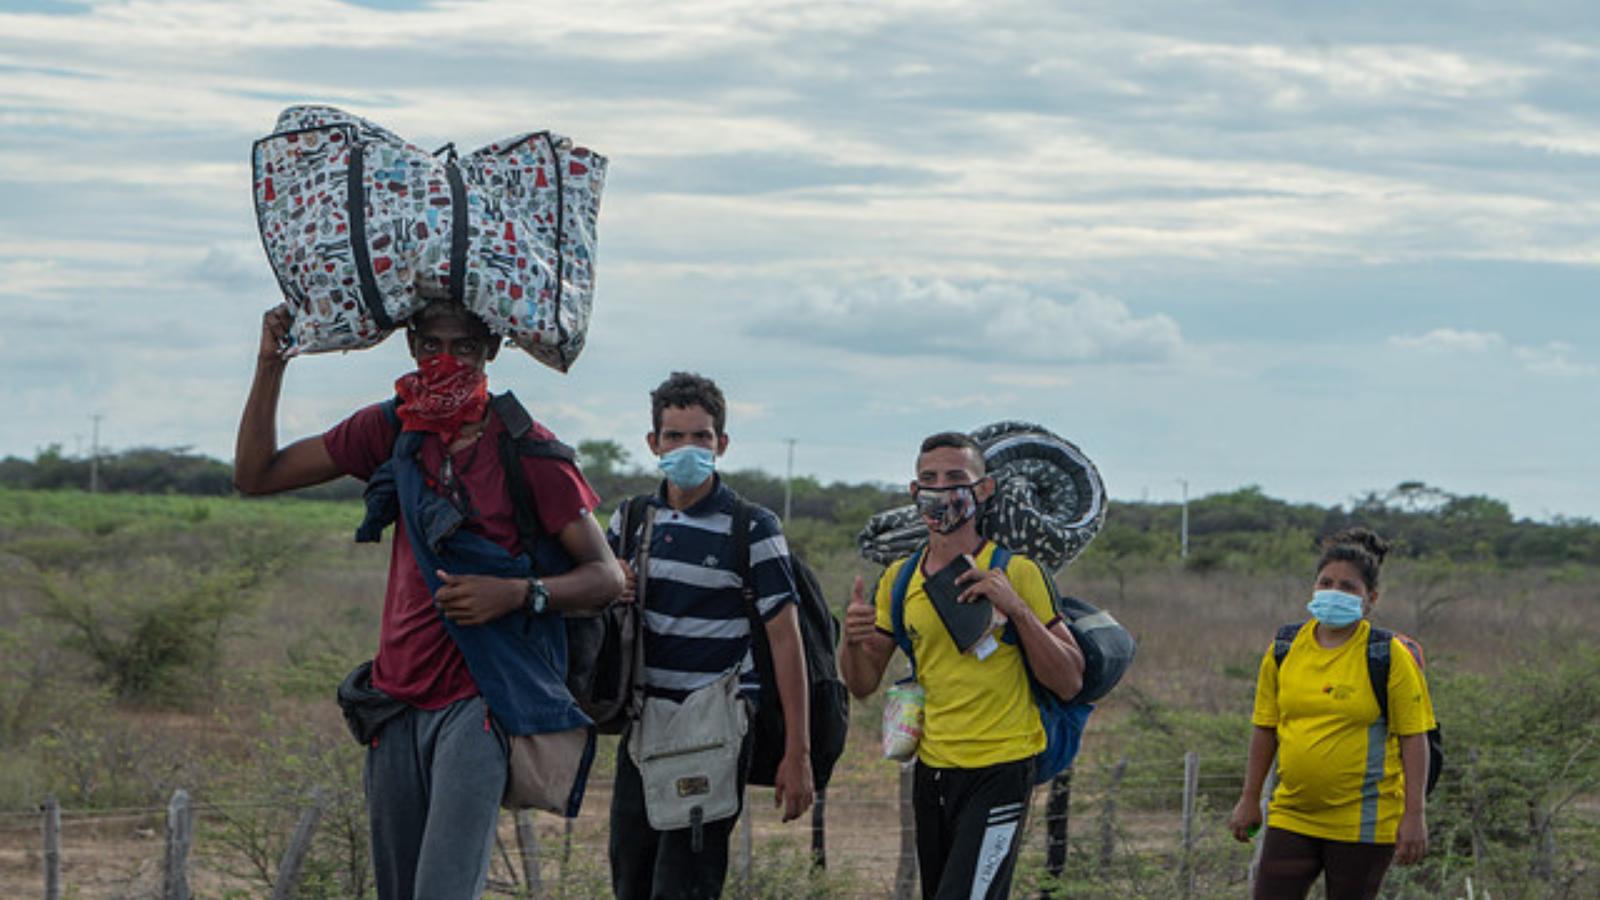 Abren concurso juvenil para buscar fórmulas contra la xenofobia